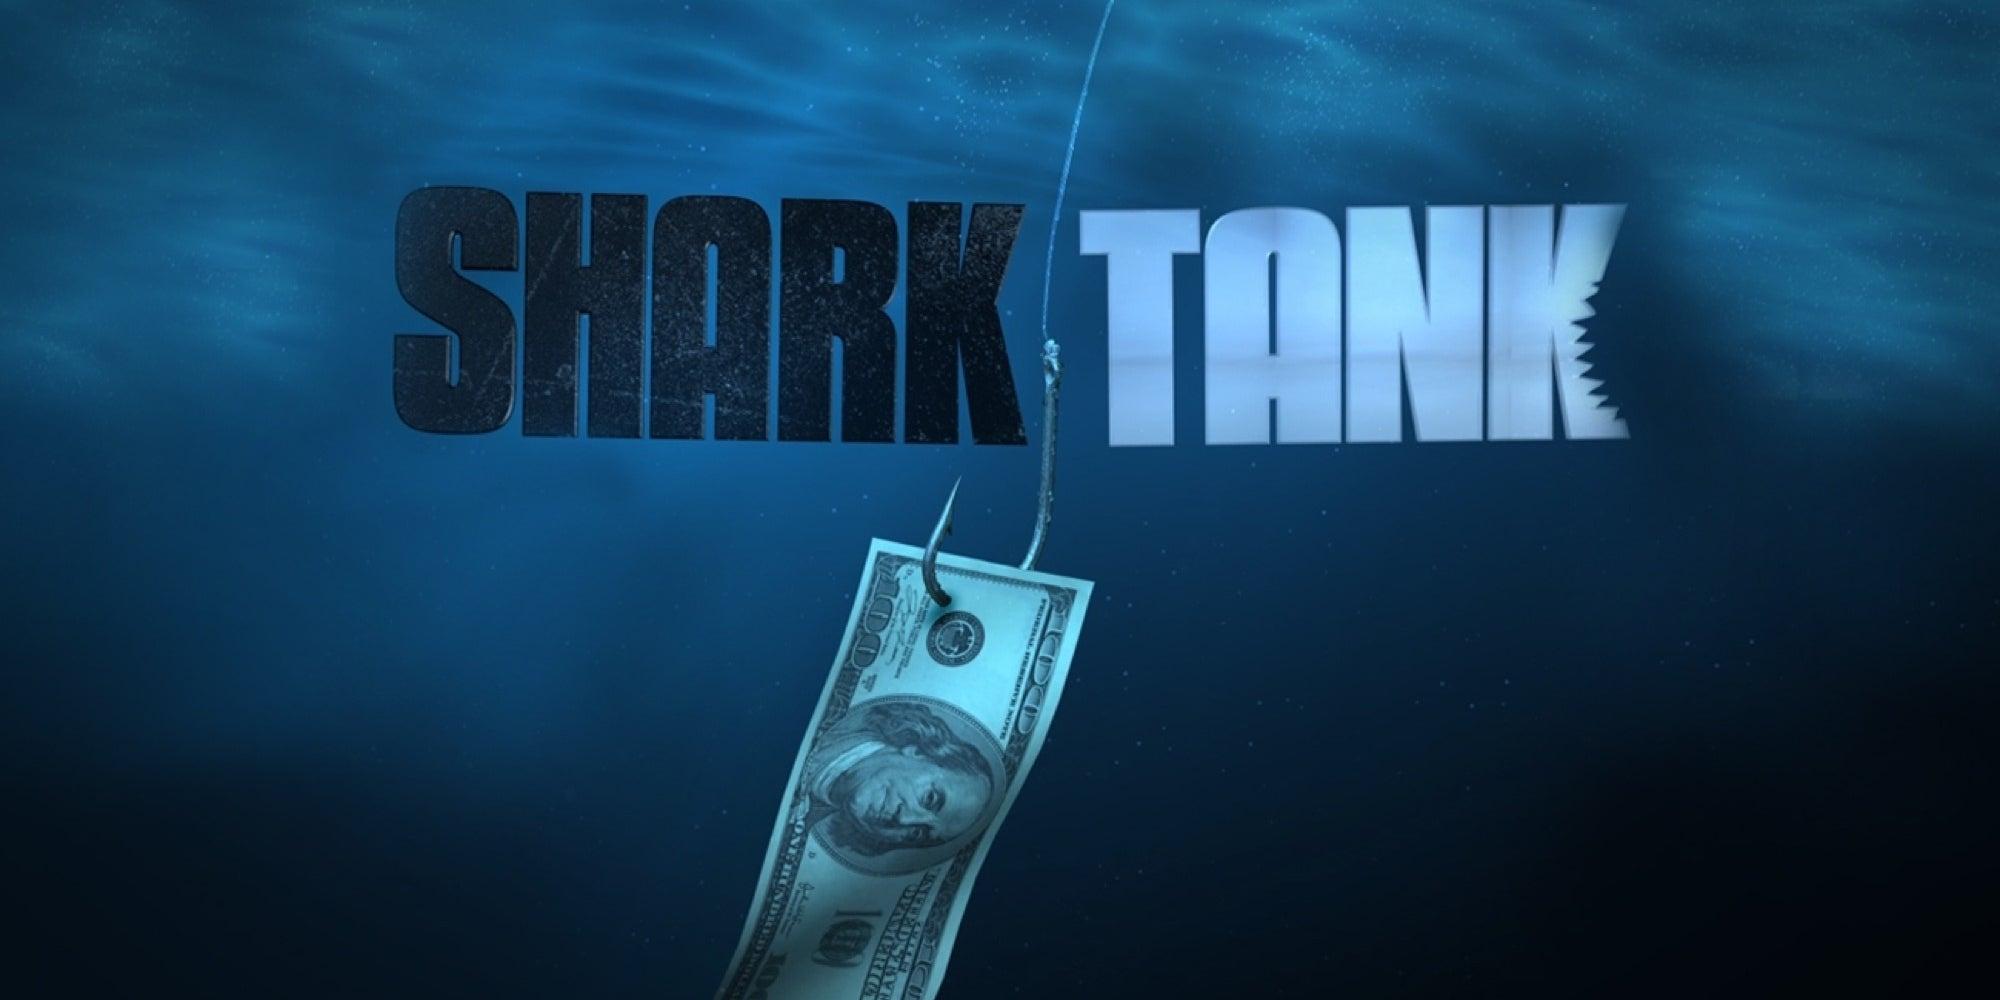 10 Shark Tank Quotes